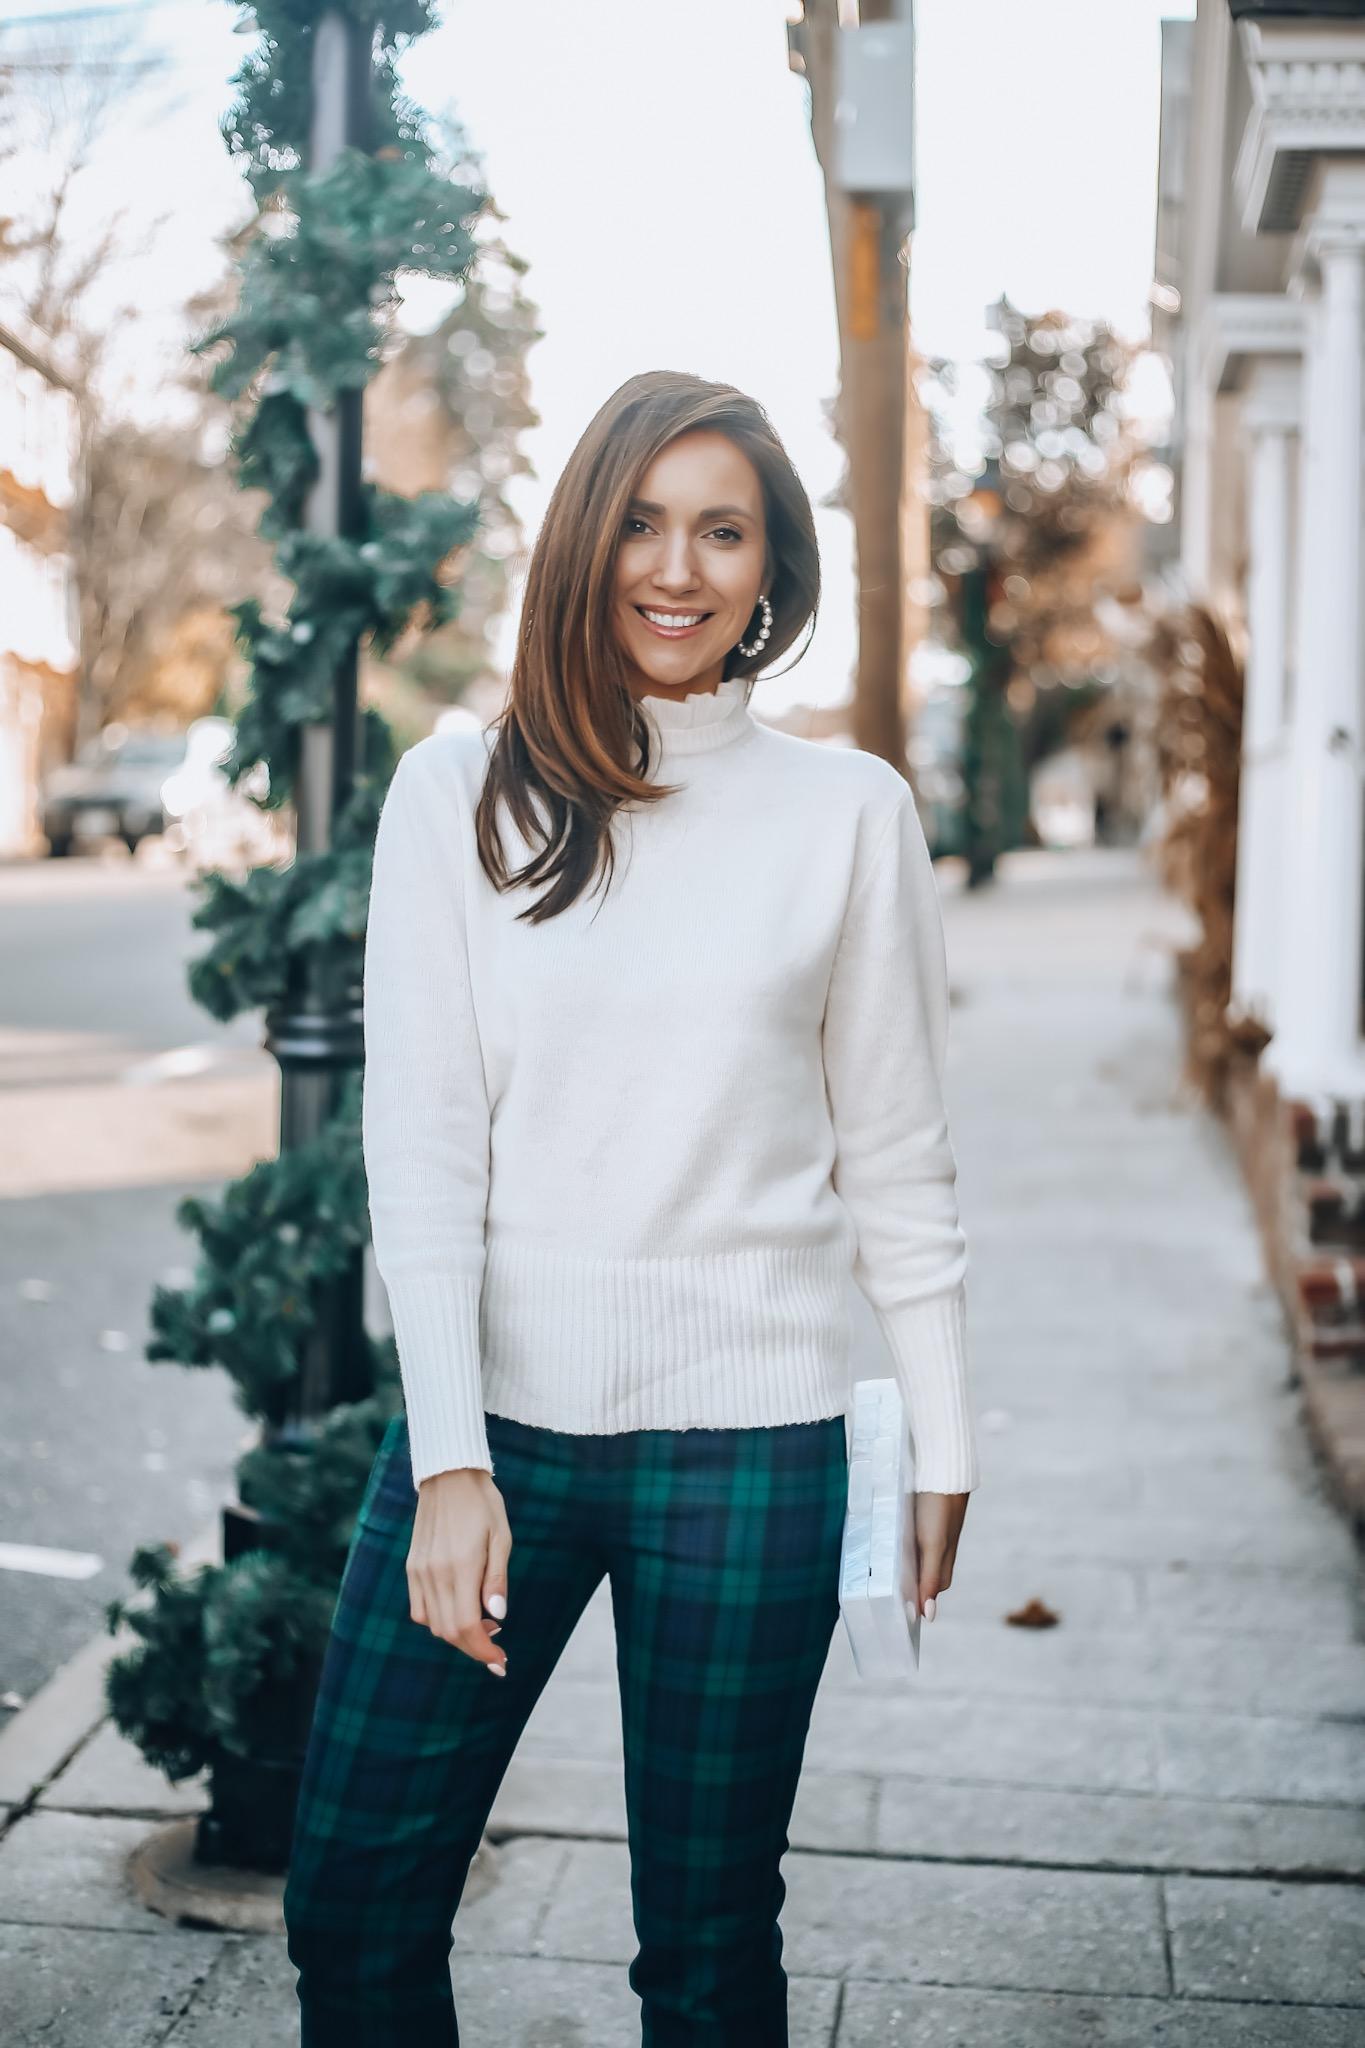 Sweater, plaid pants, J.Crew holiday style